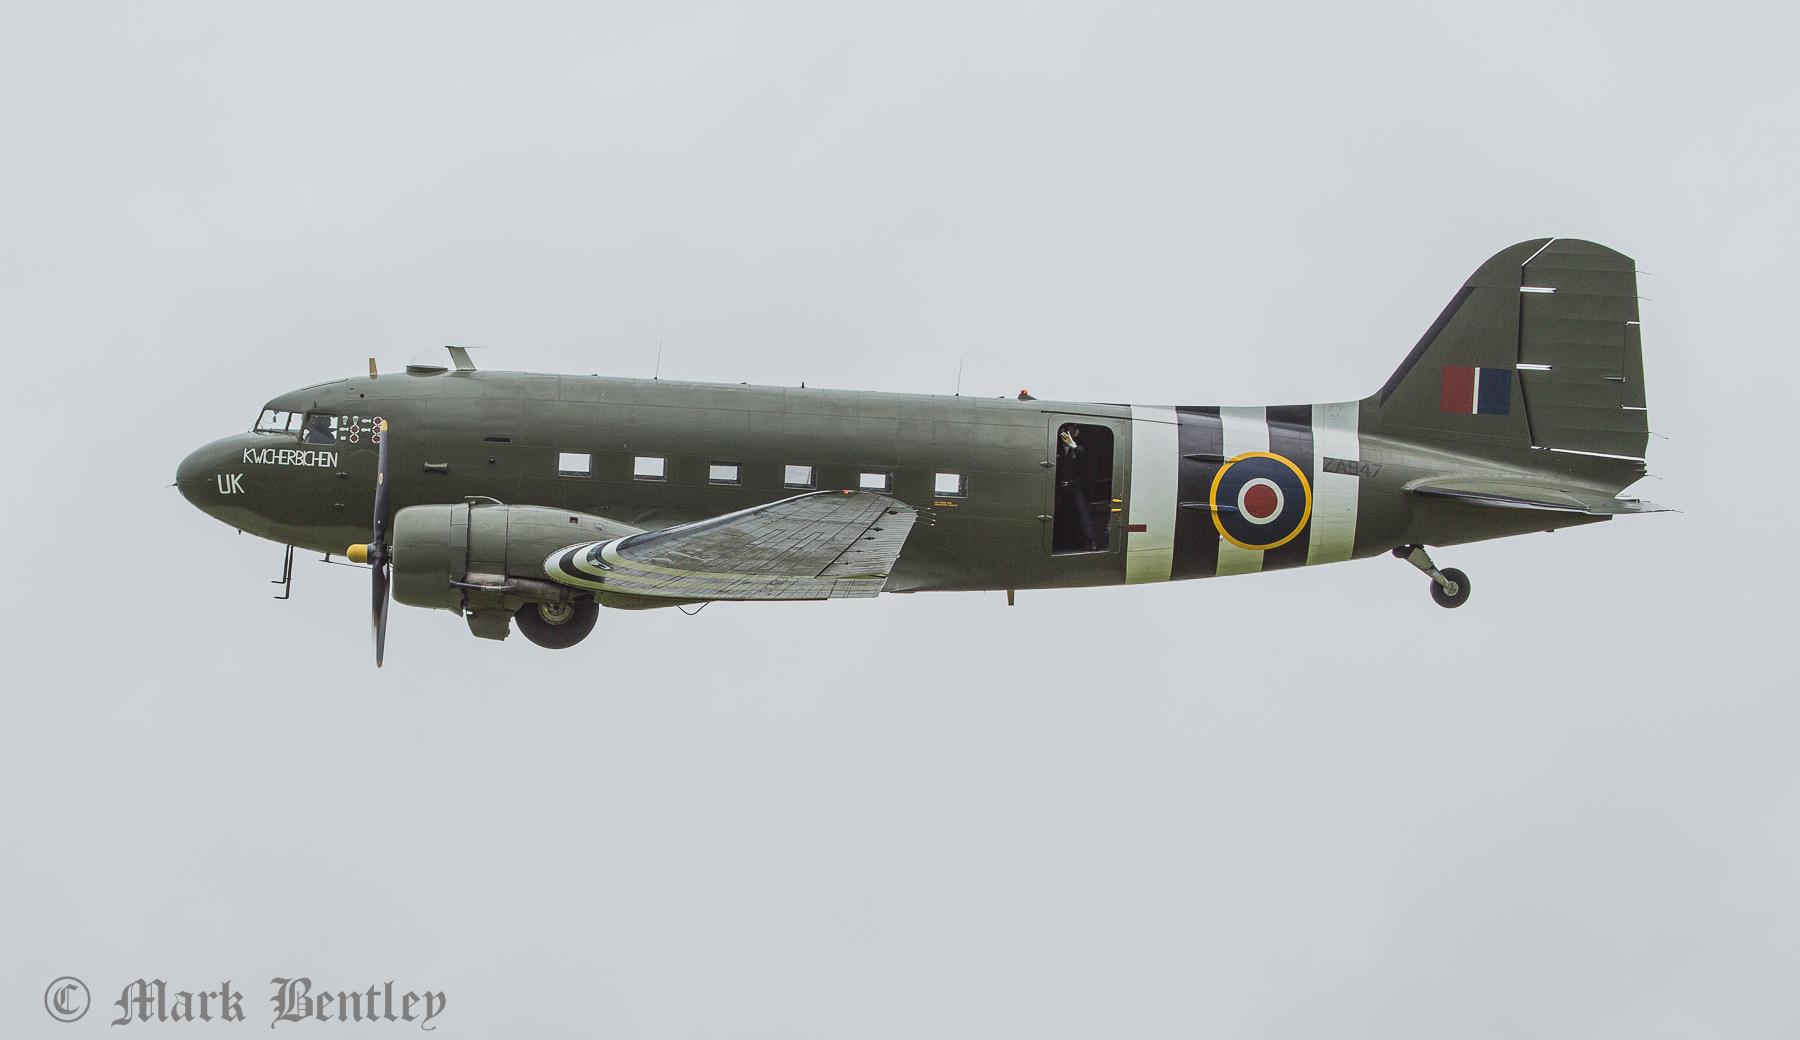 C006 C-47 Dakota